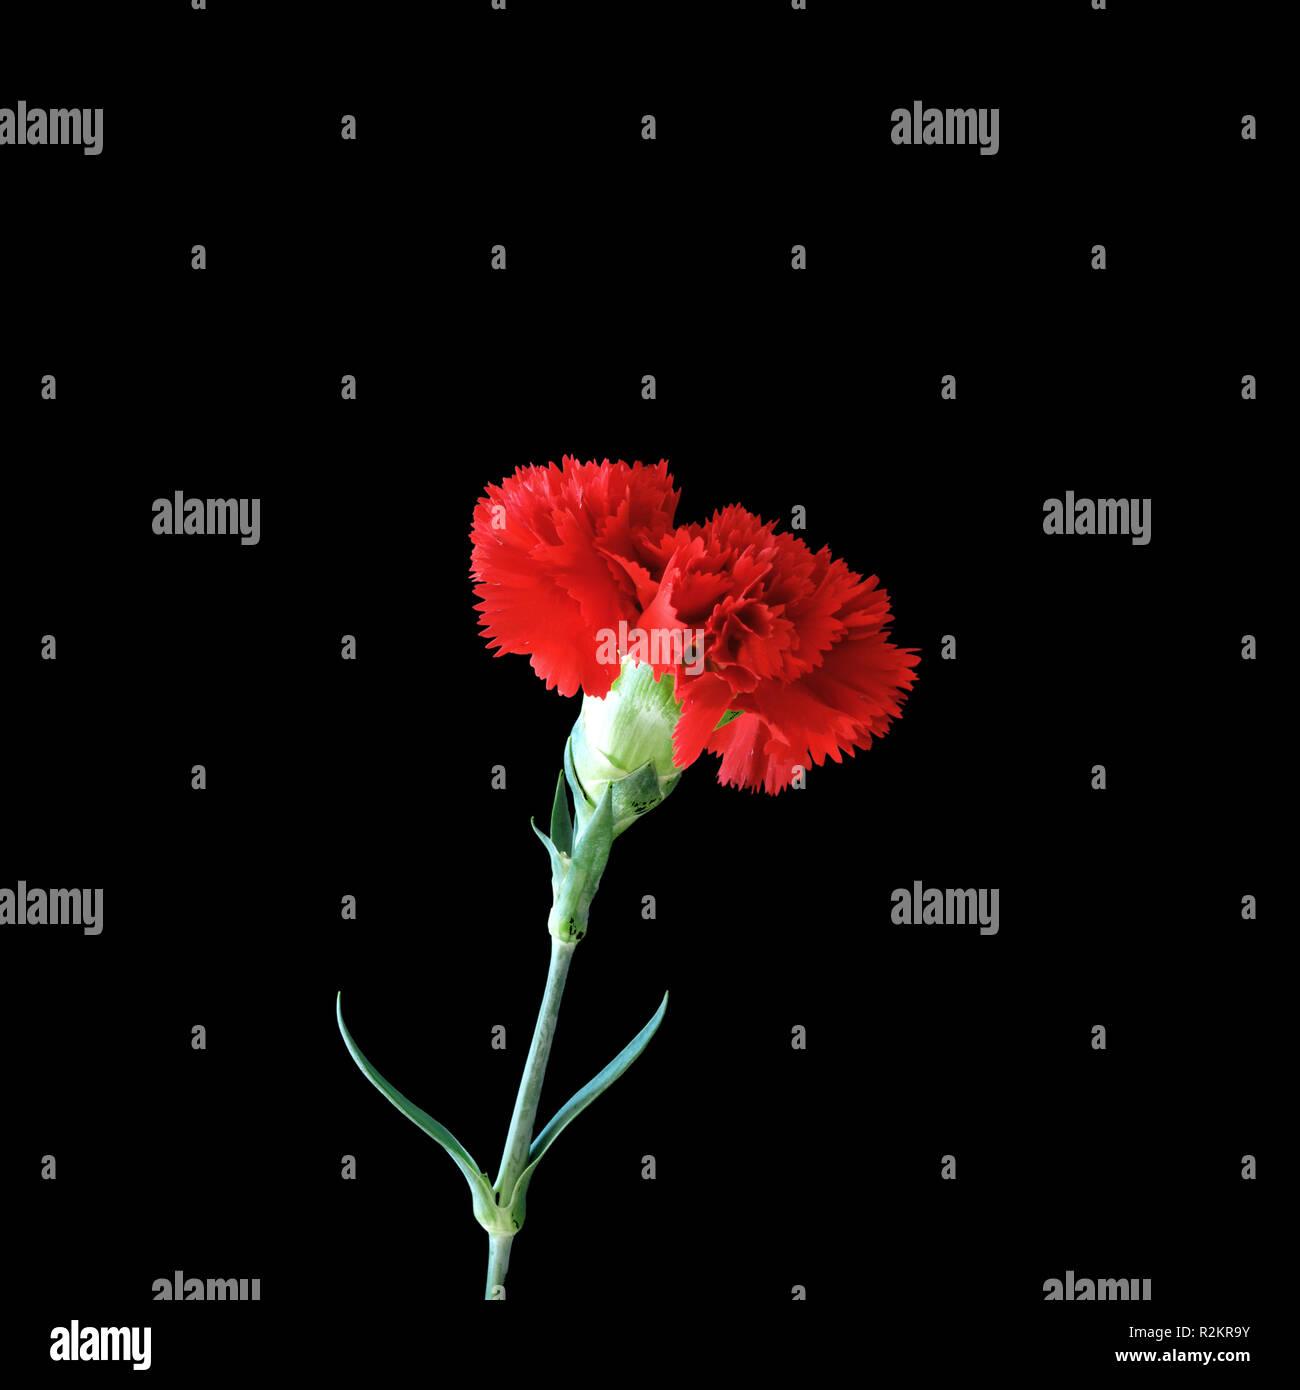 zeus flower - Stock Image